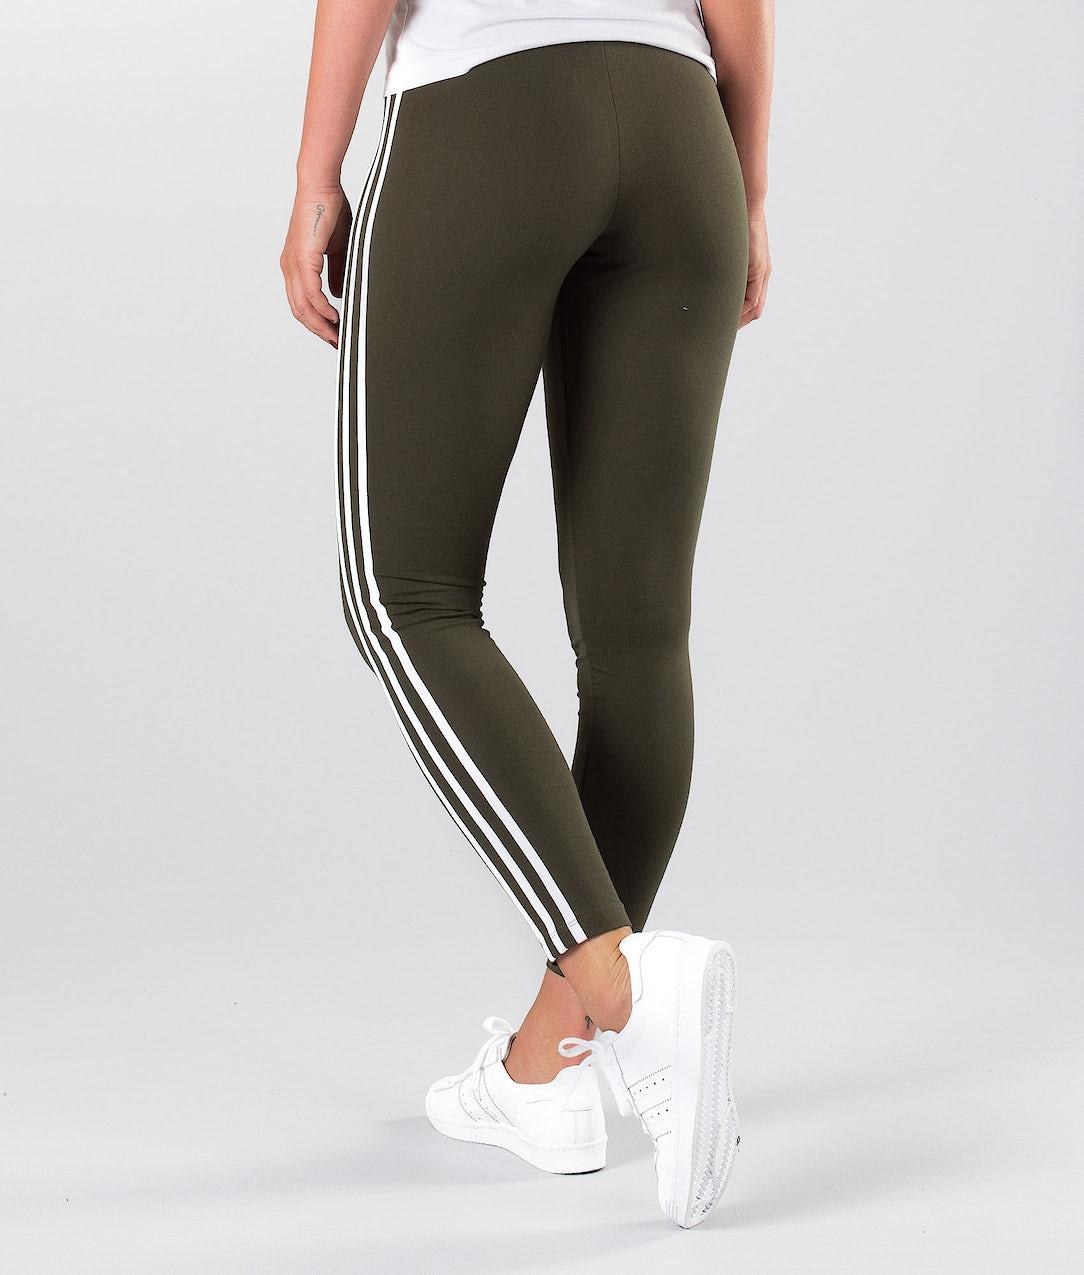 outlet online classic classic style Adidas Originals 3 Stripe Leggings Night Cargo